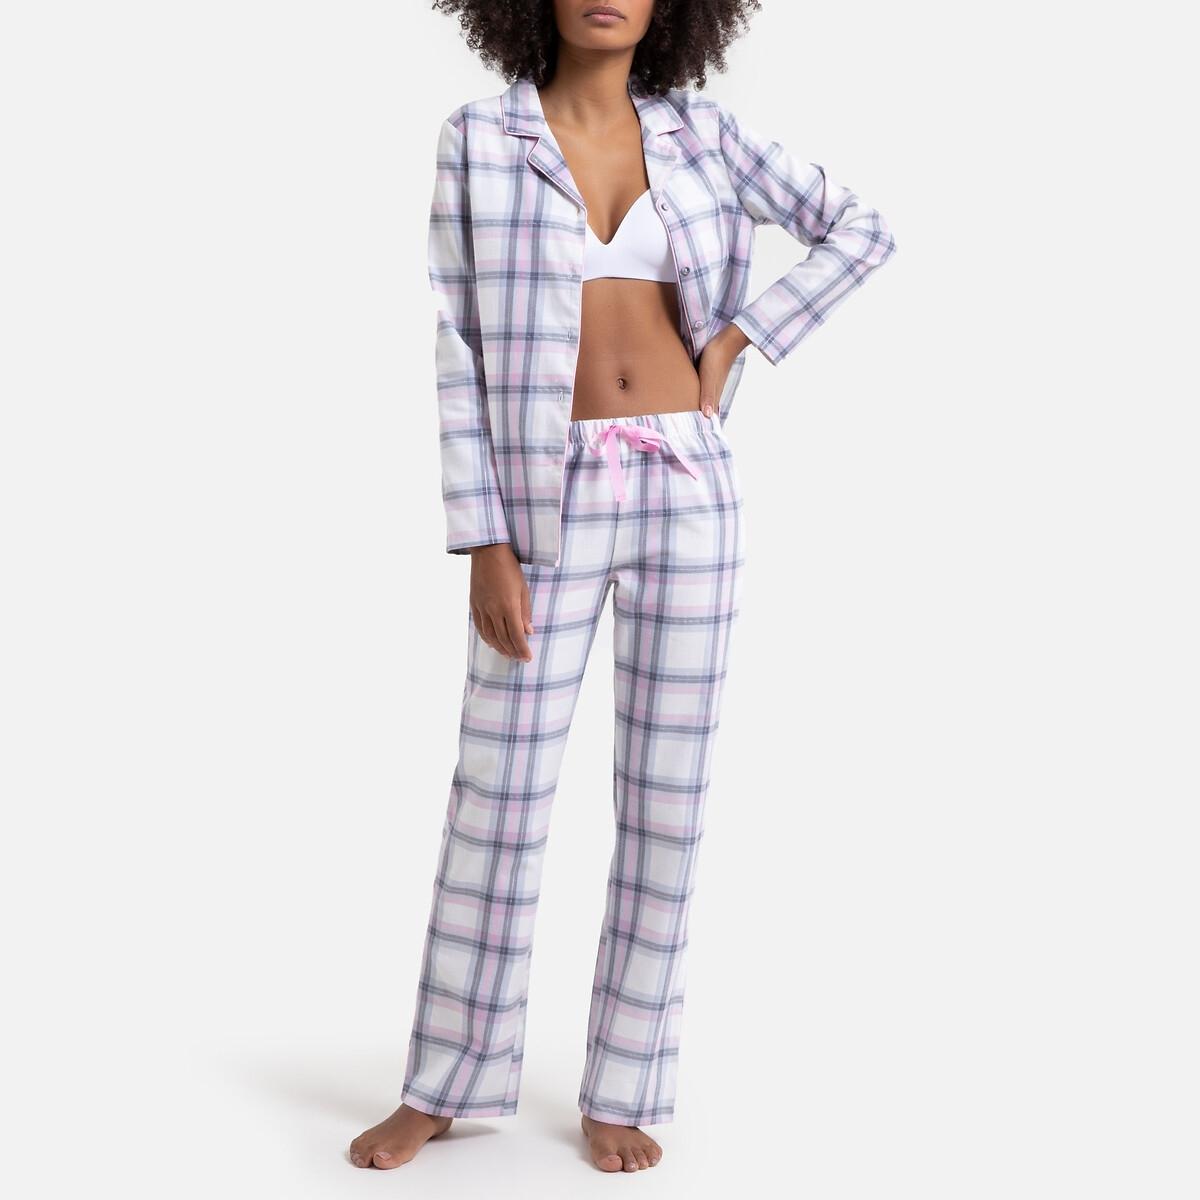 Pijama a cuadros 100% algodón